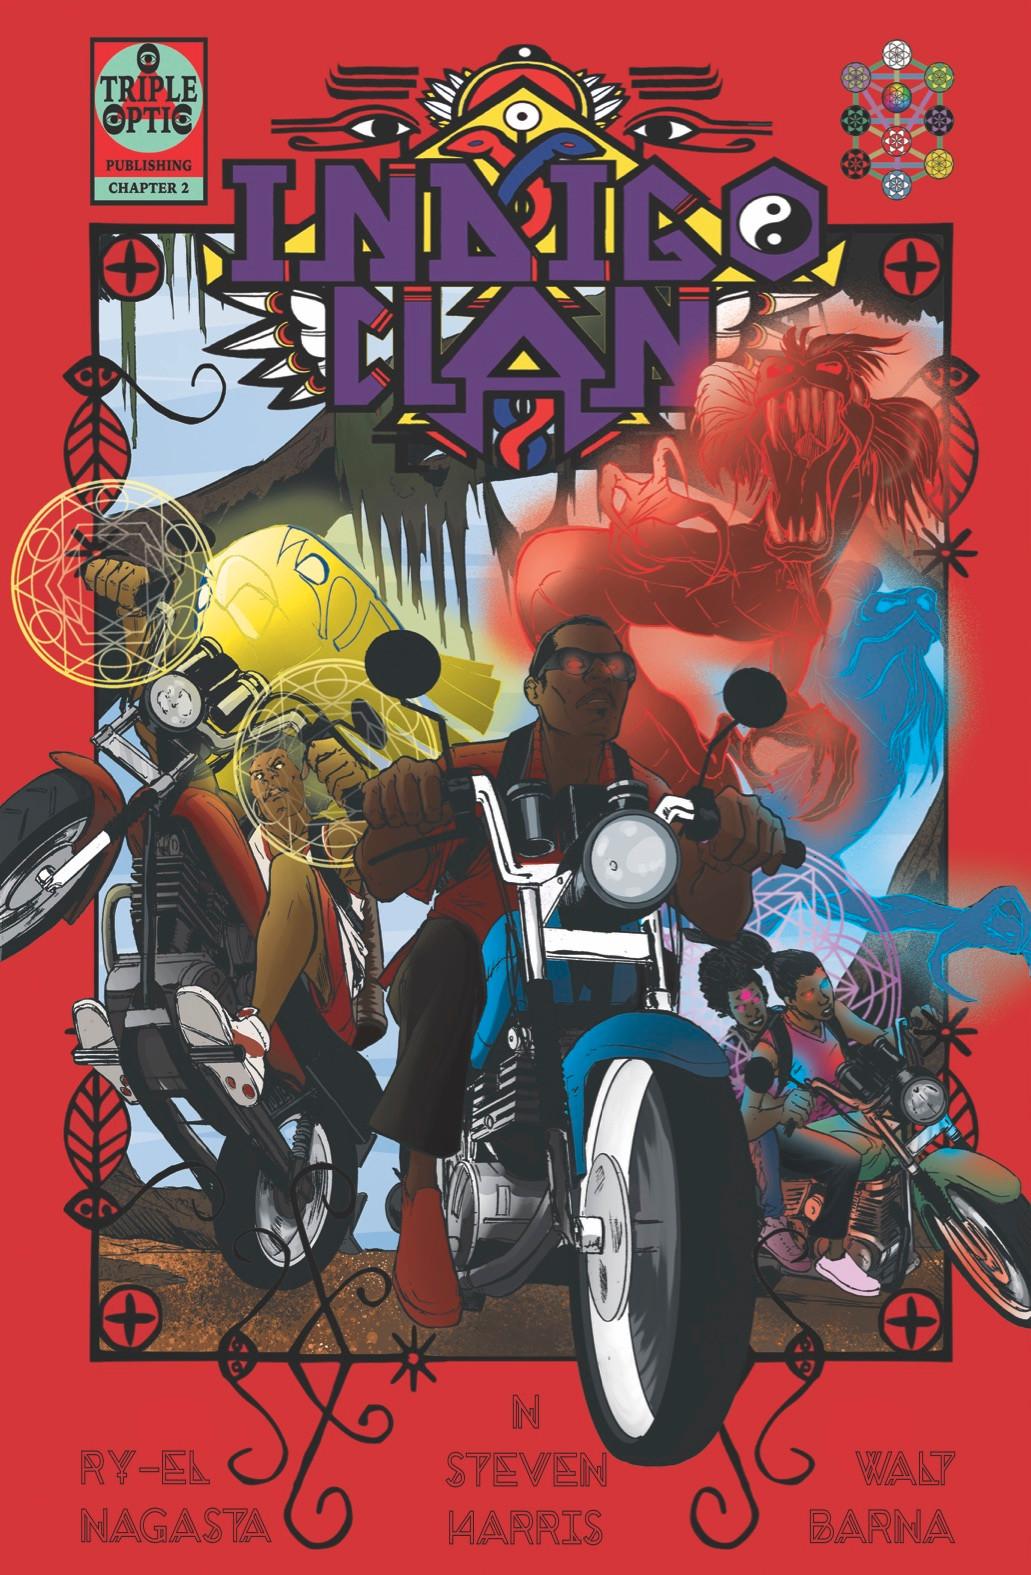 Indigo Clan Ch2 front cover.jpg